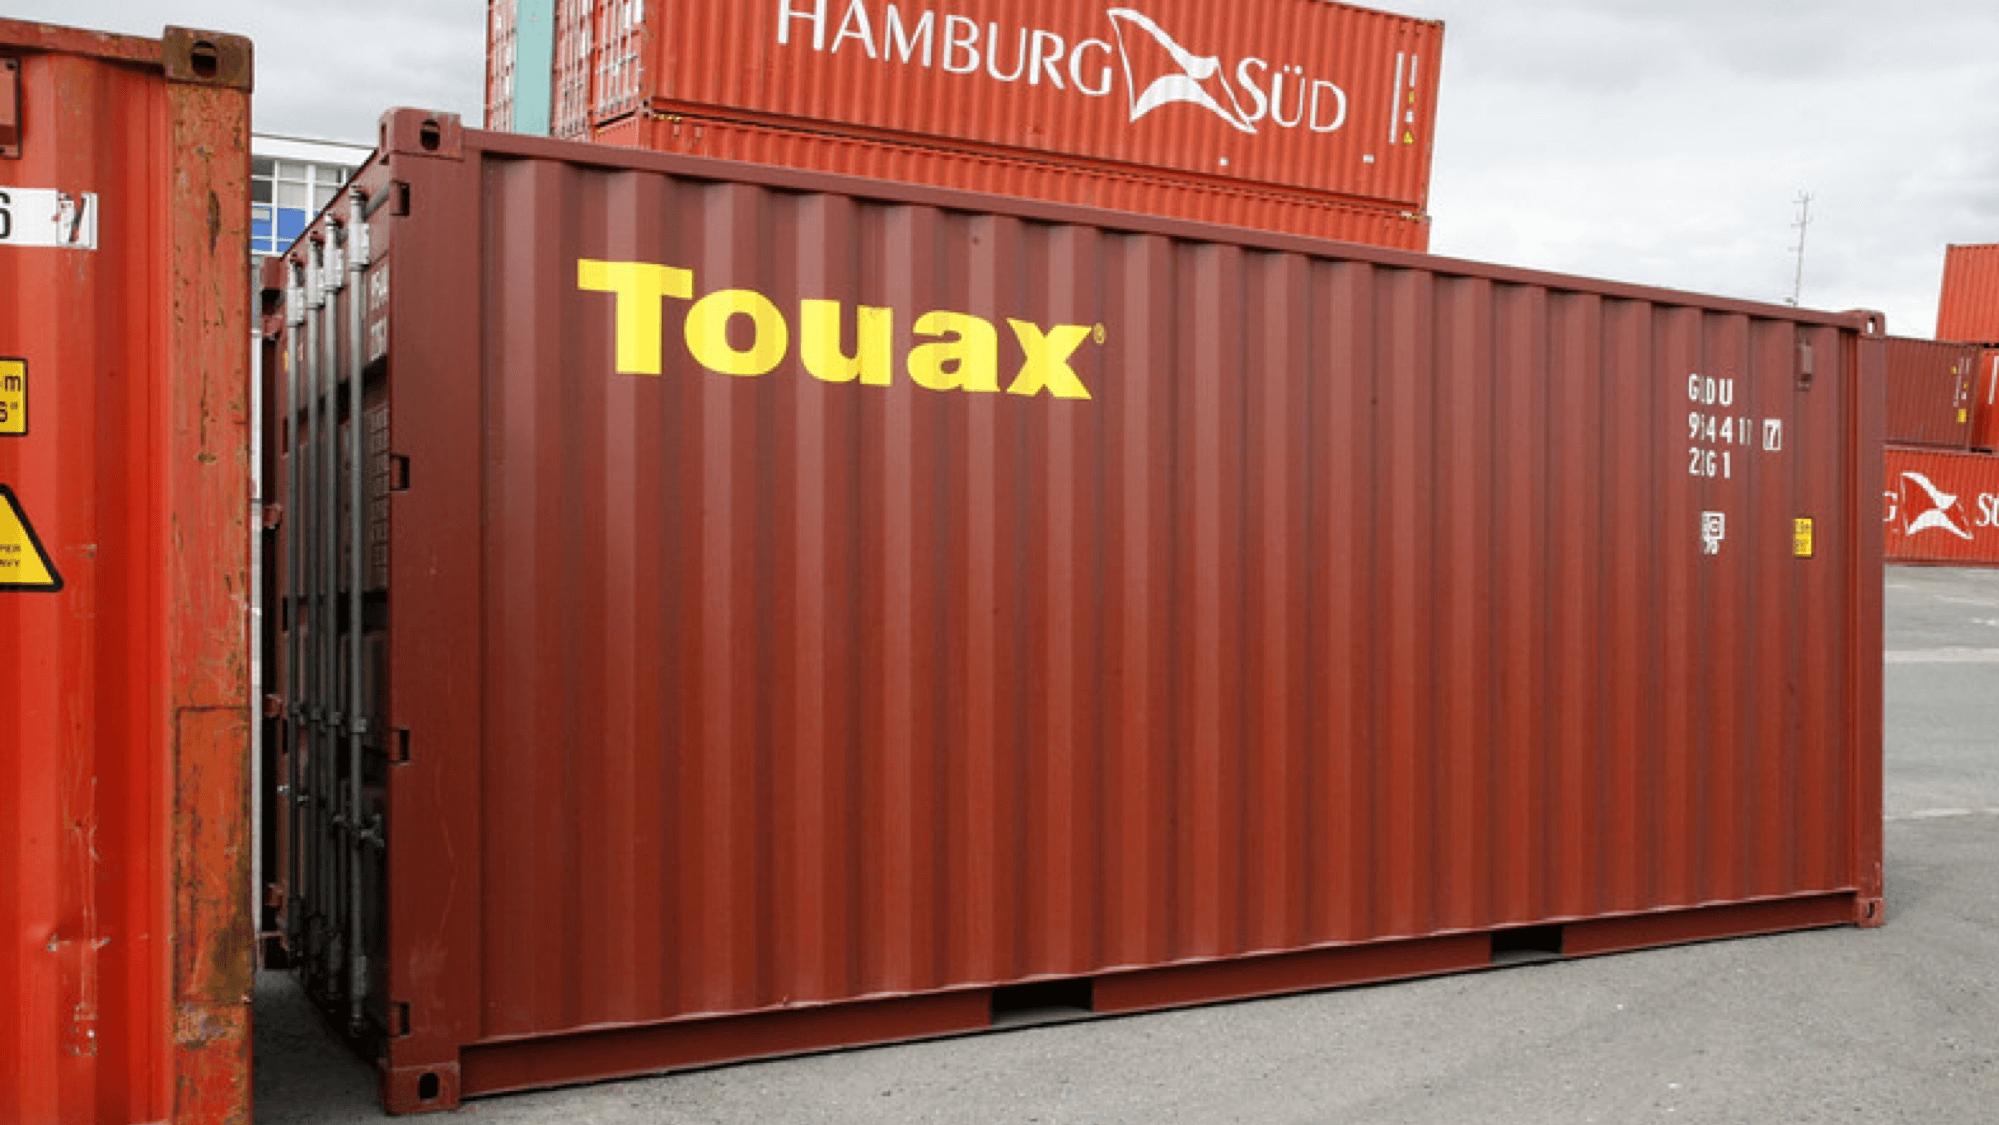 Touax container